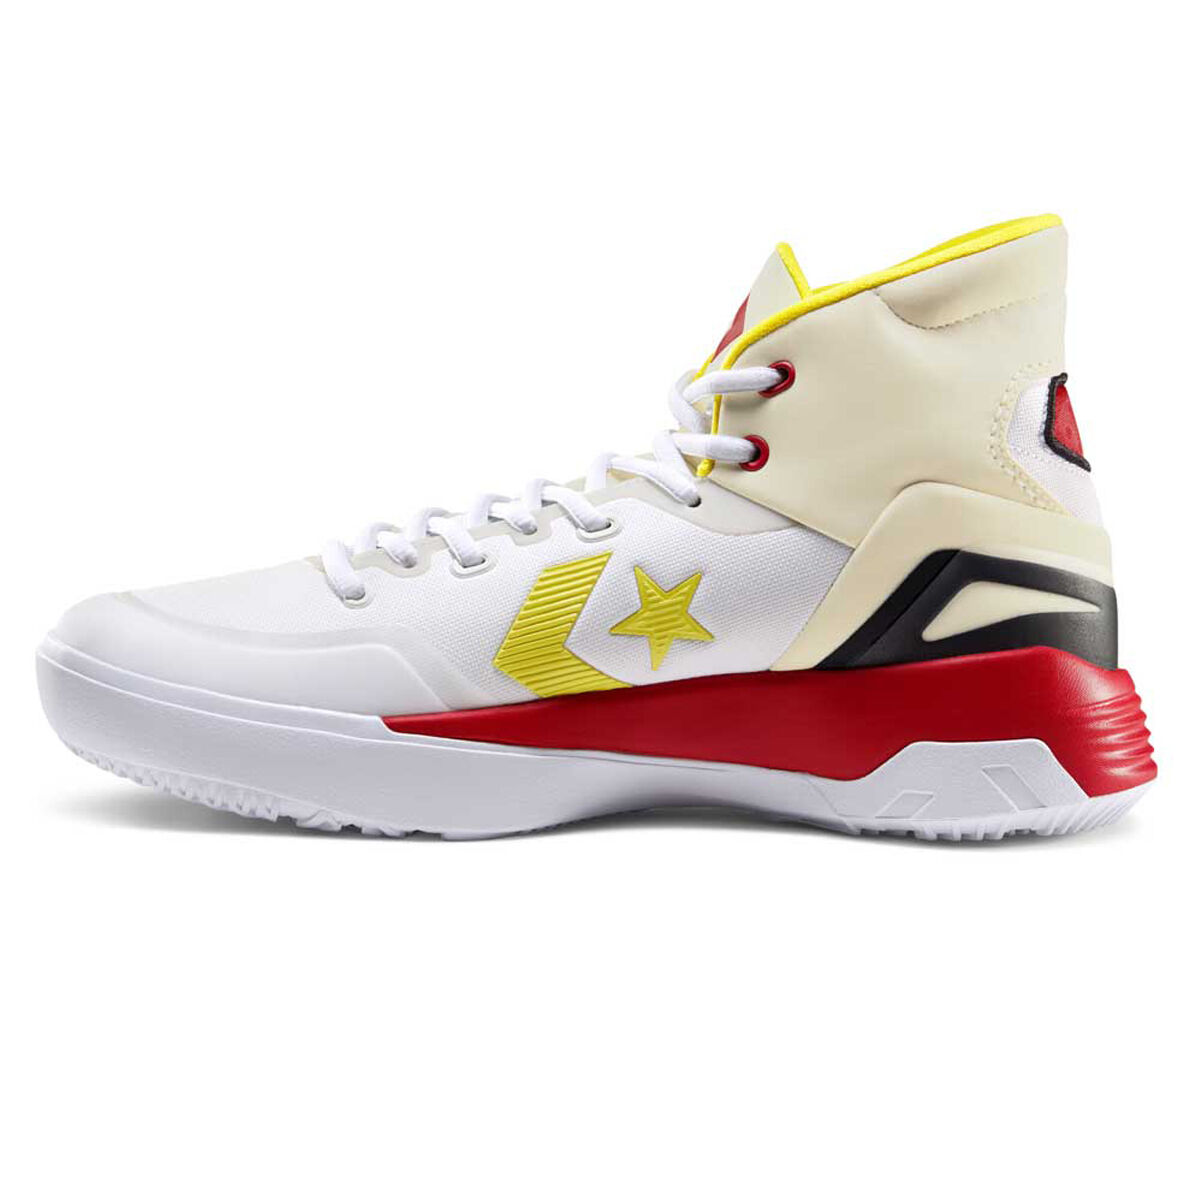 Converse G4 Mid Mens Basketball Shoes